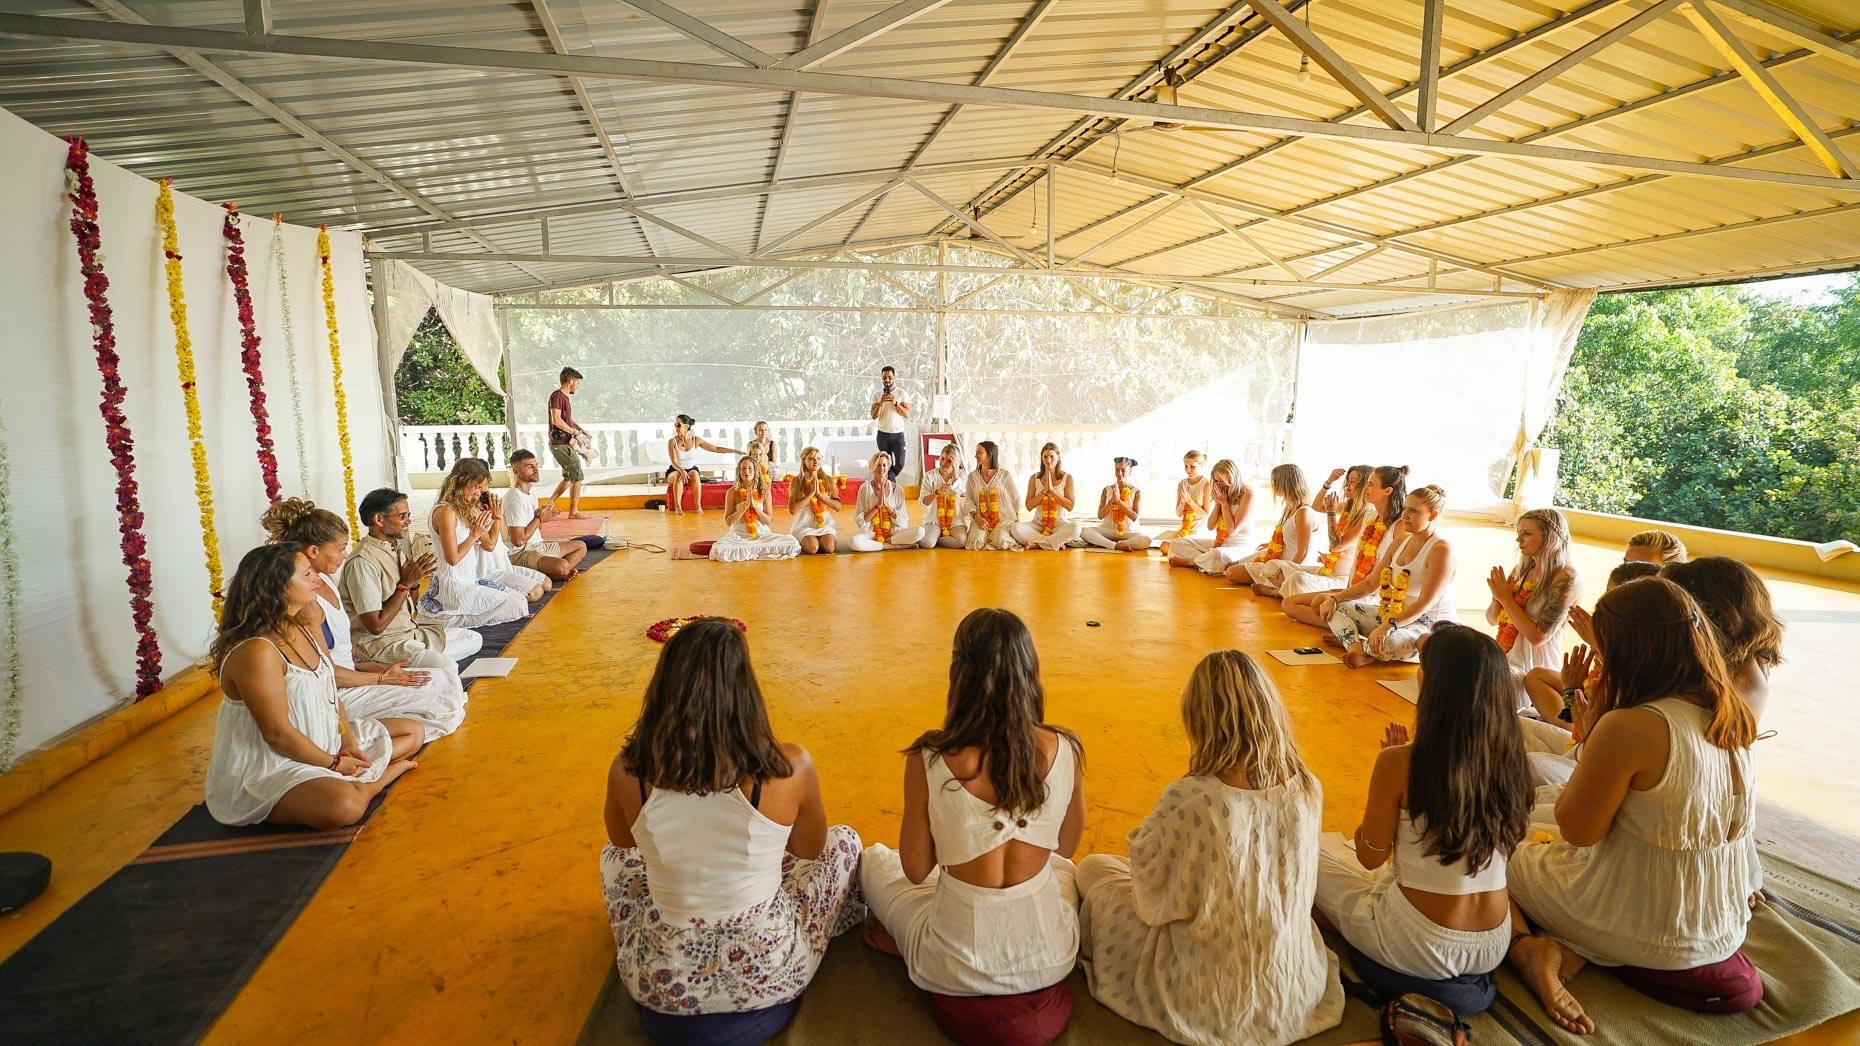 Sampoorna Yoga School in Goa India